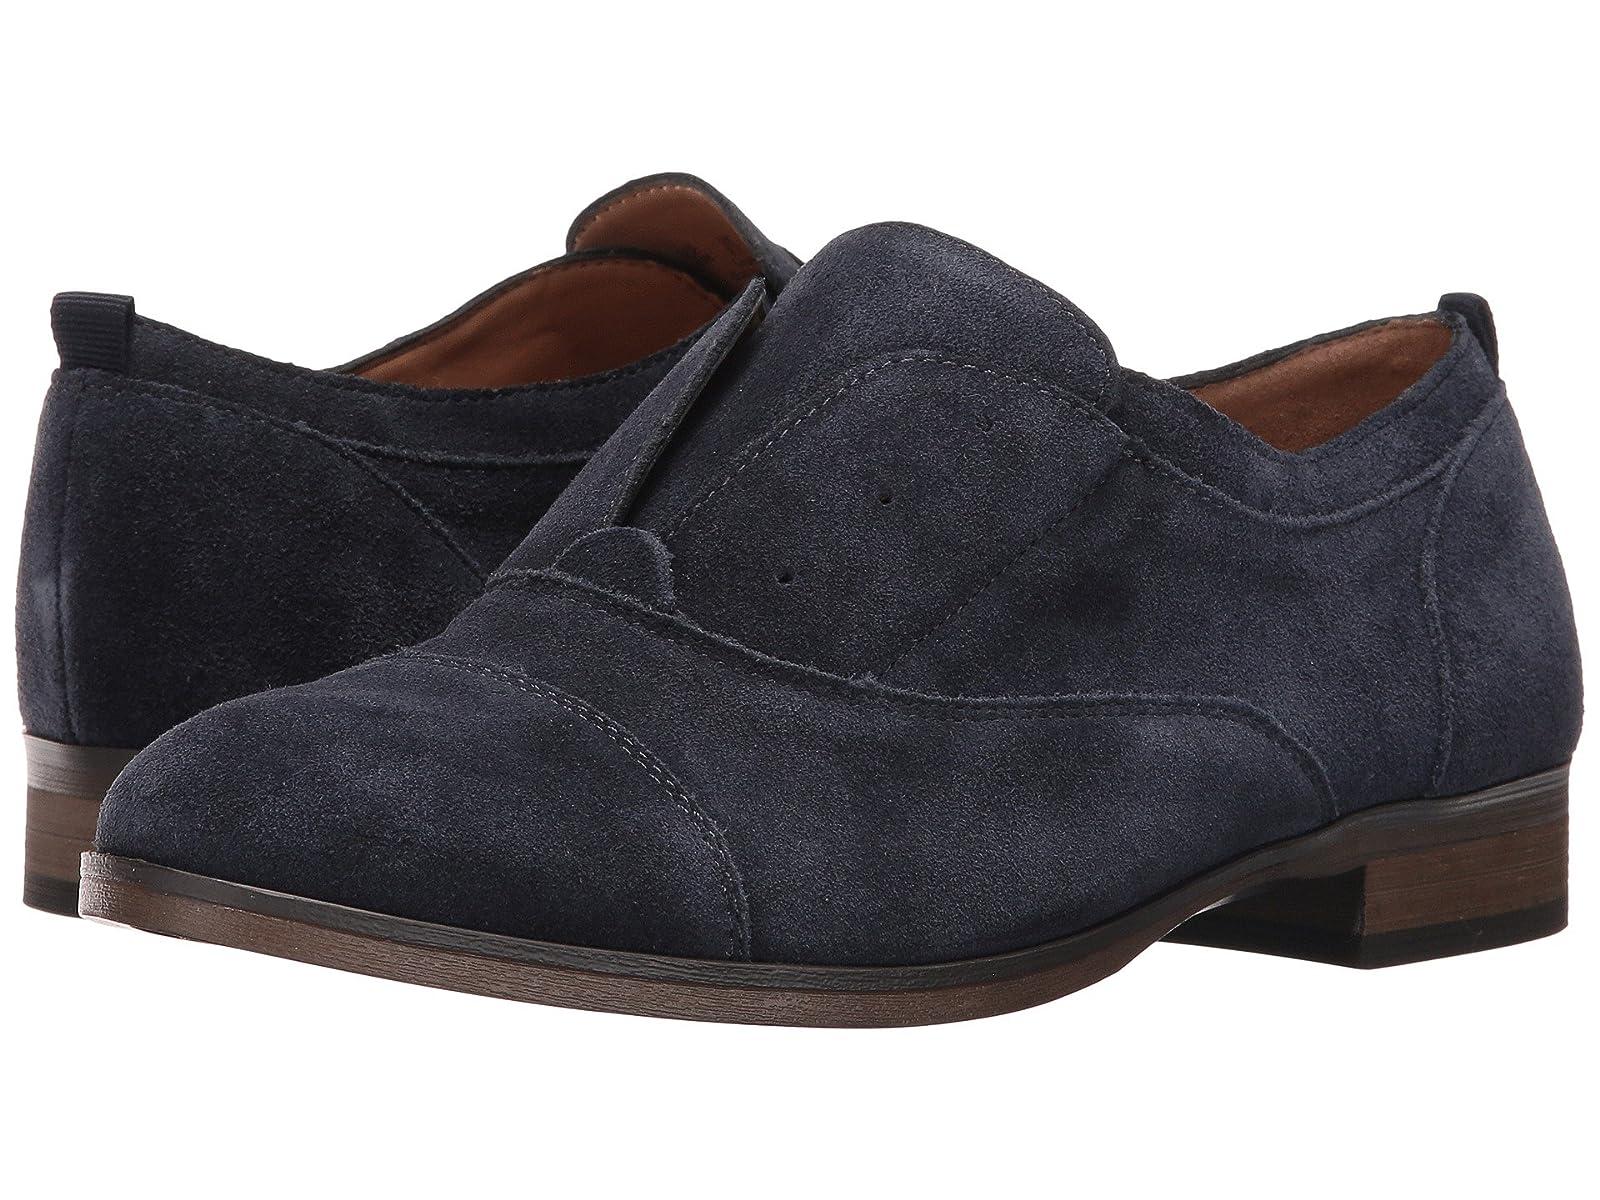 Franco Sarto BlanchetteCheap and distinctive eye-catching shoes